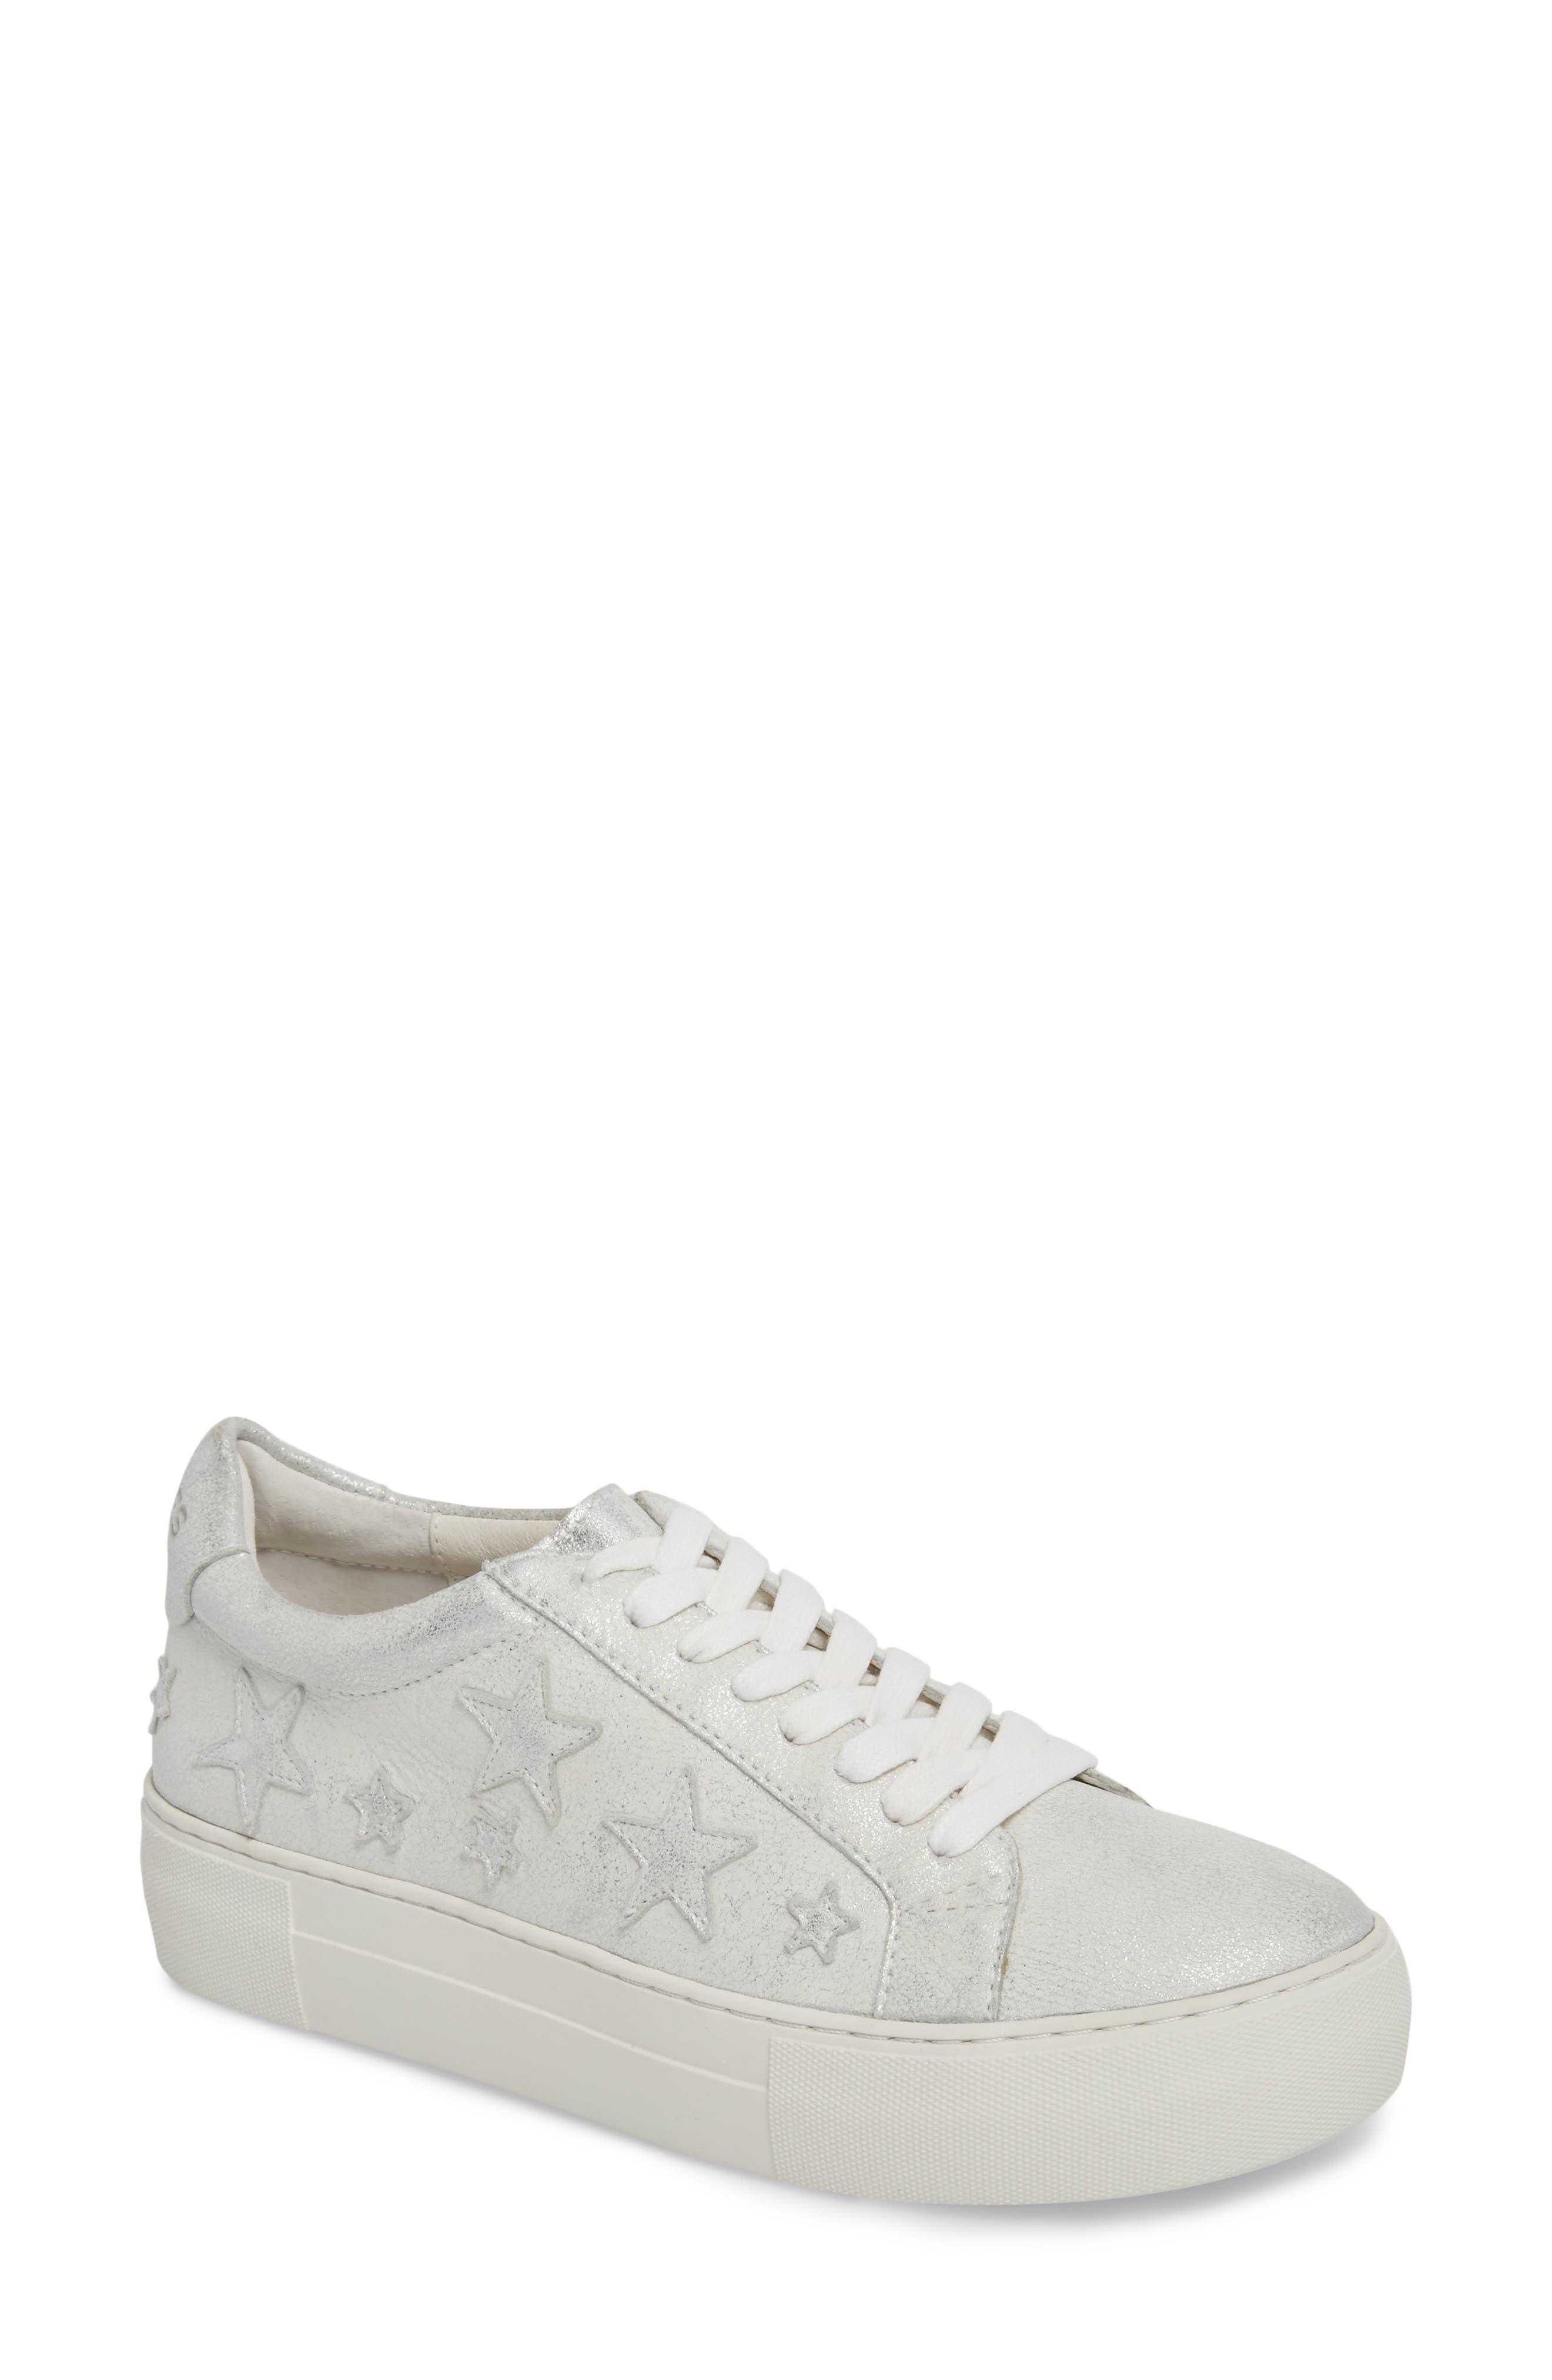 Apostle Sneaker,                         Main,                         color,